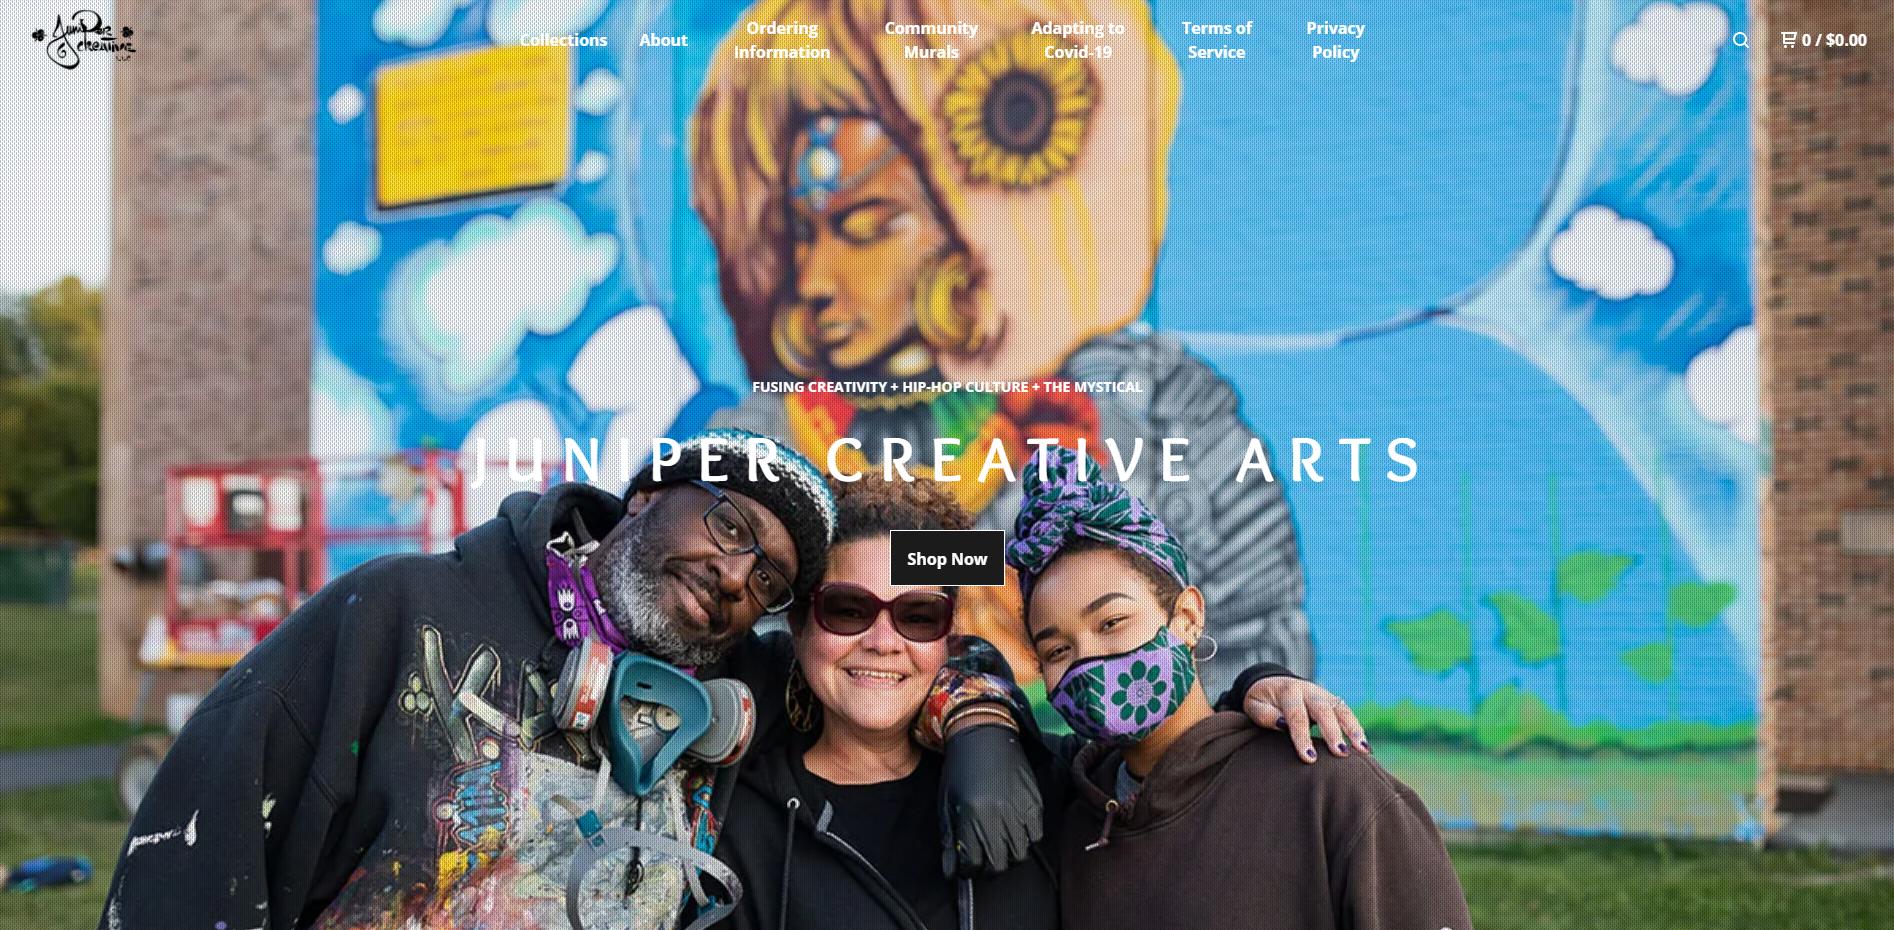 The Juniper Creative website homepage